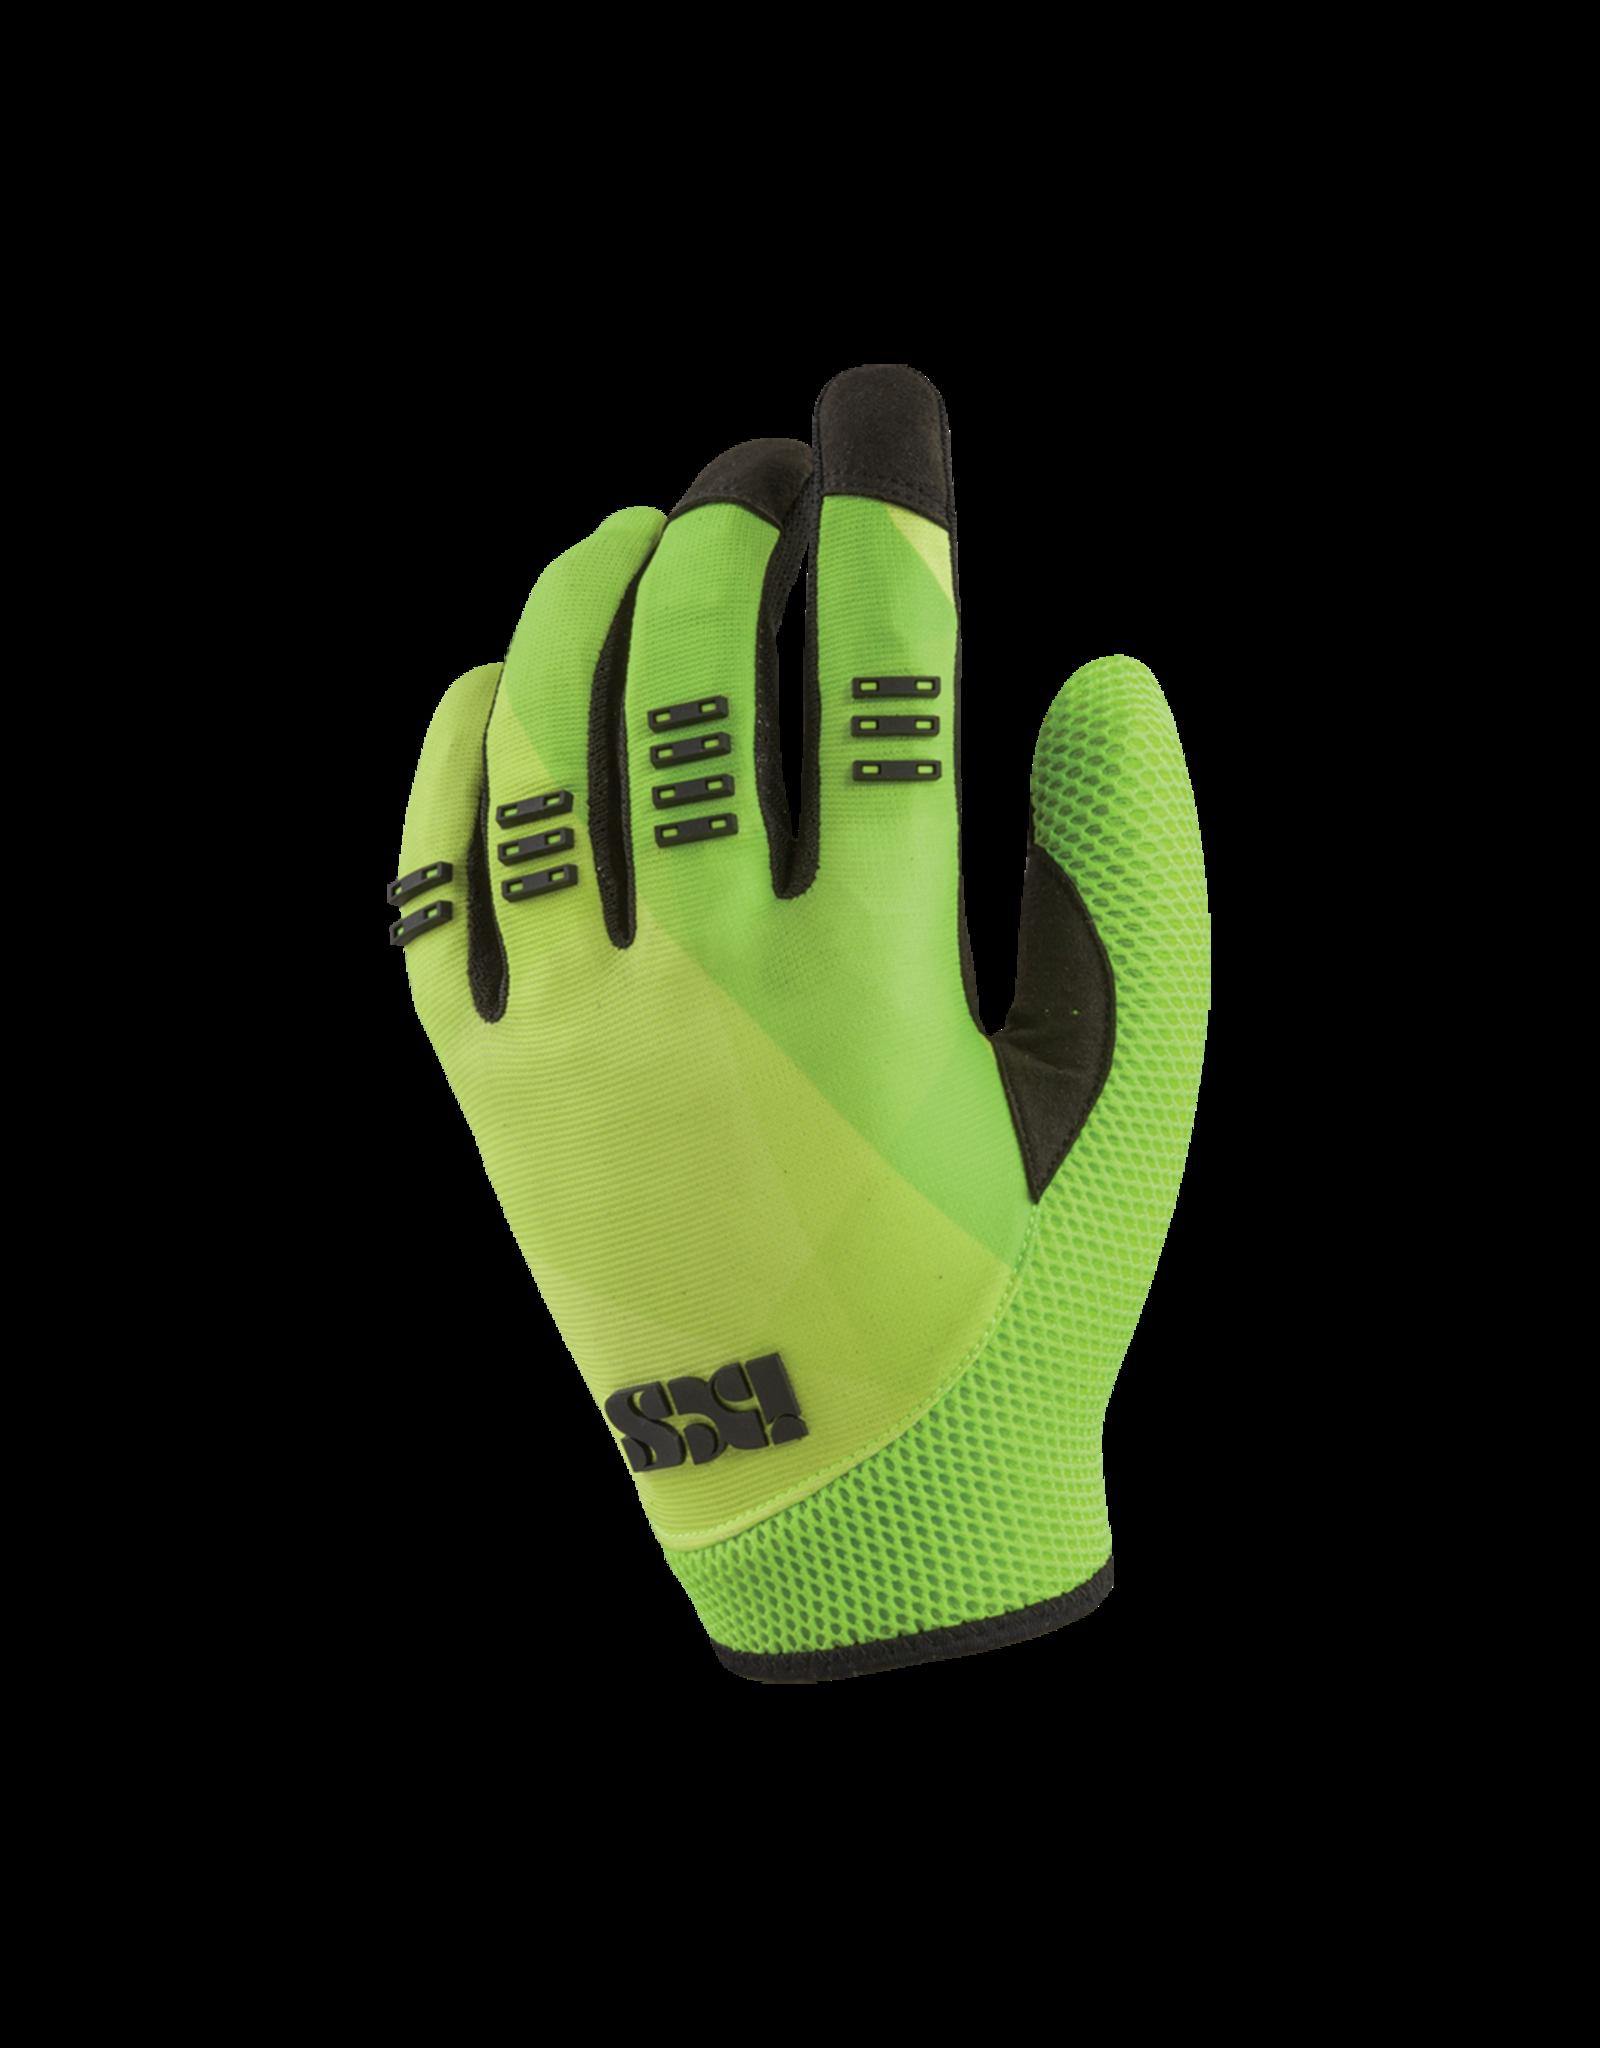 Gloves IXS BC-X3.1